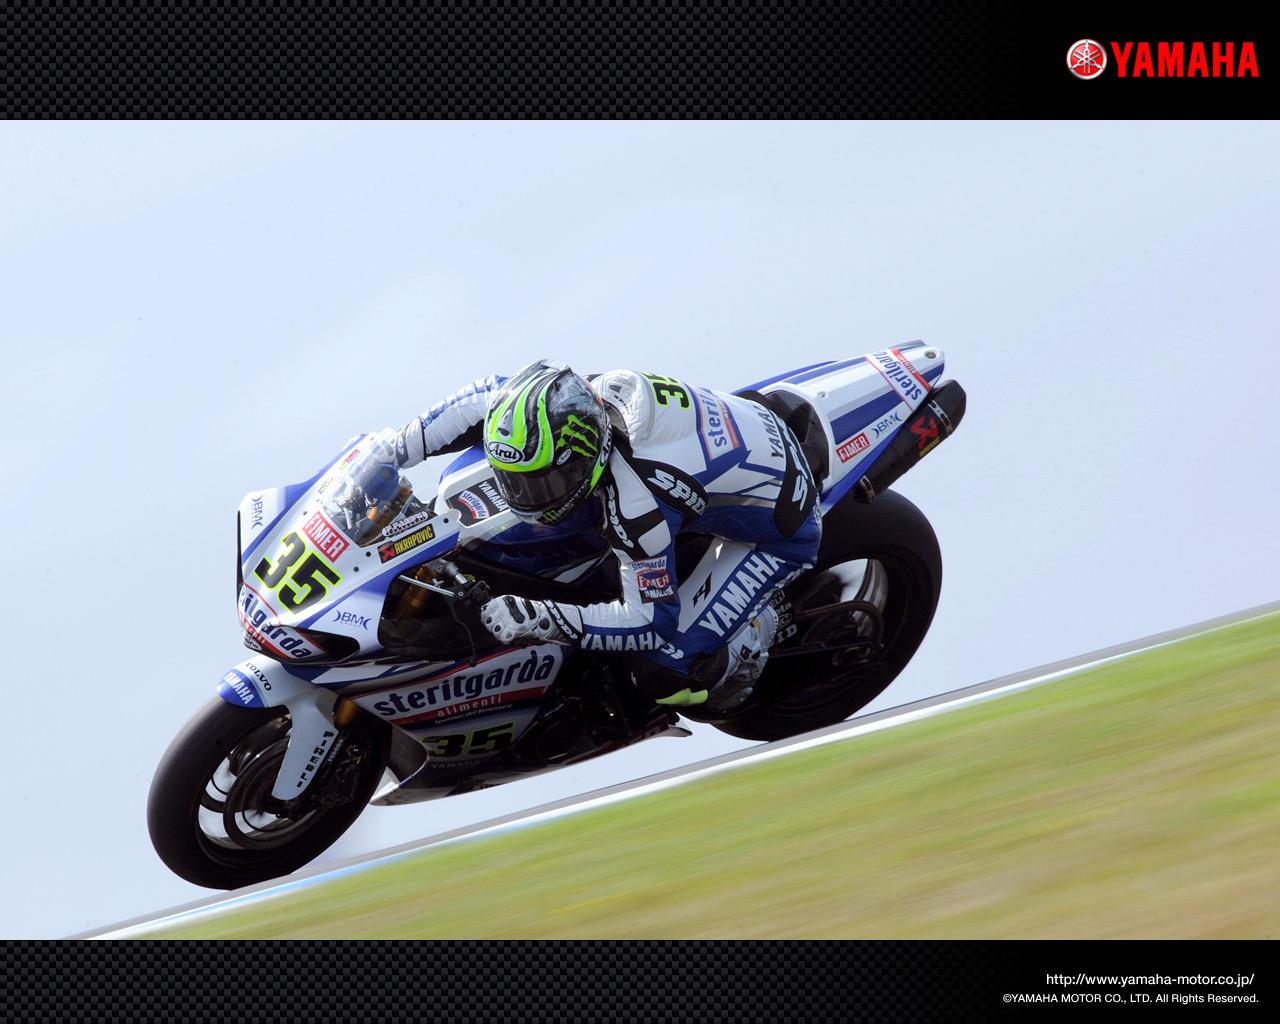 Wallpapers - race   Yamaha Motor Co., Ltd.